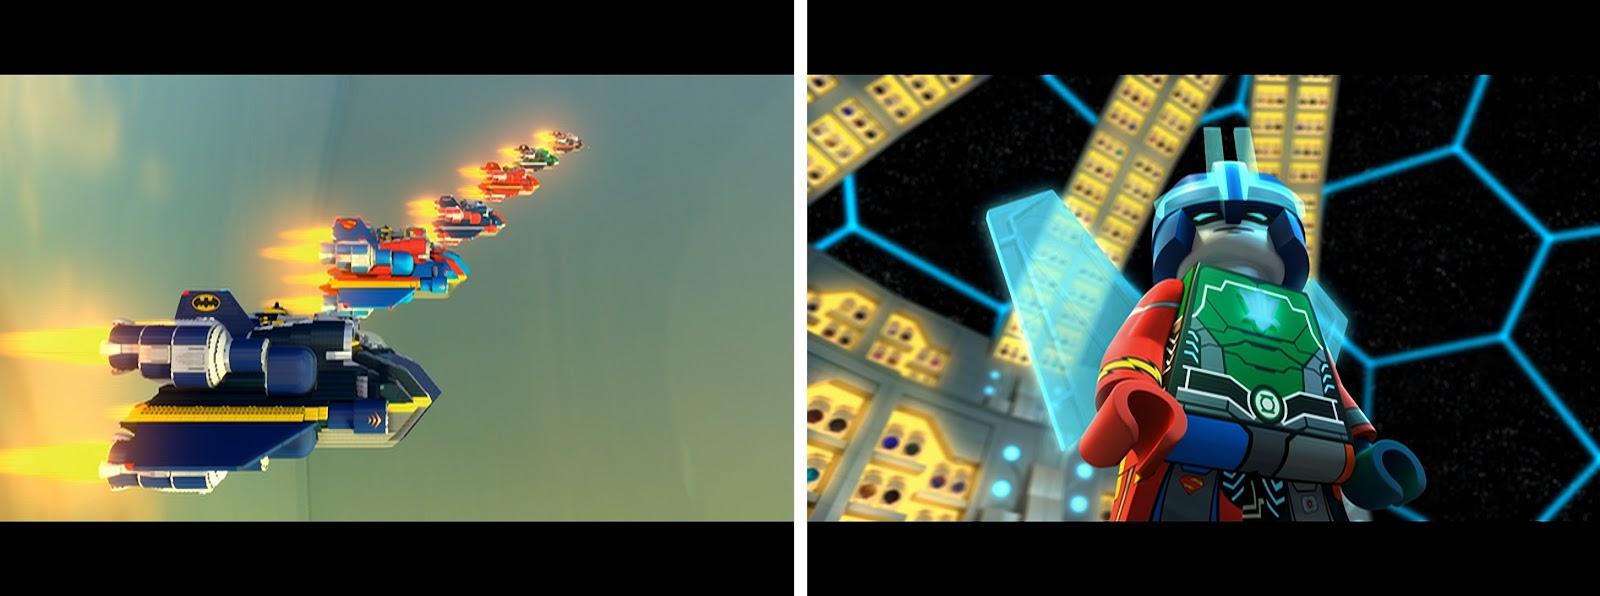 LEGO DC Justice League, LEGO DC animation, LEGO superheroes